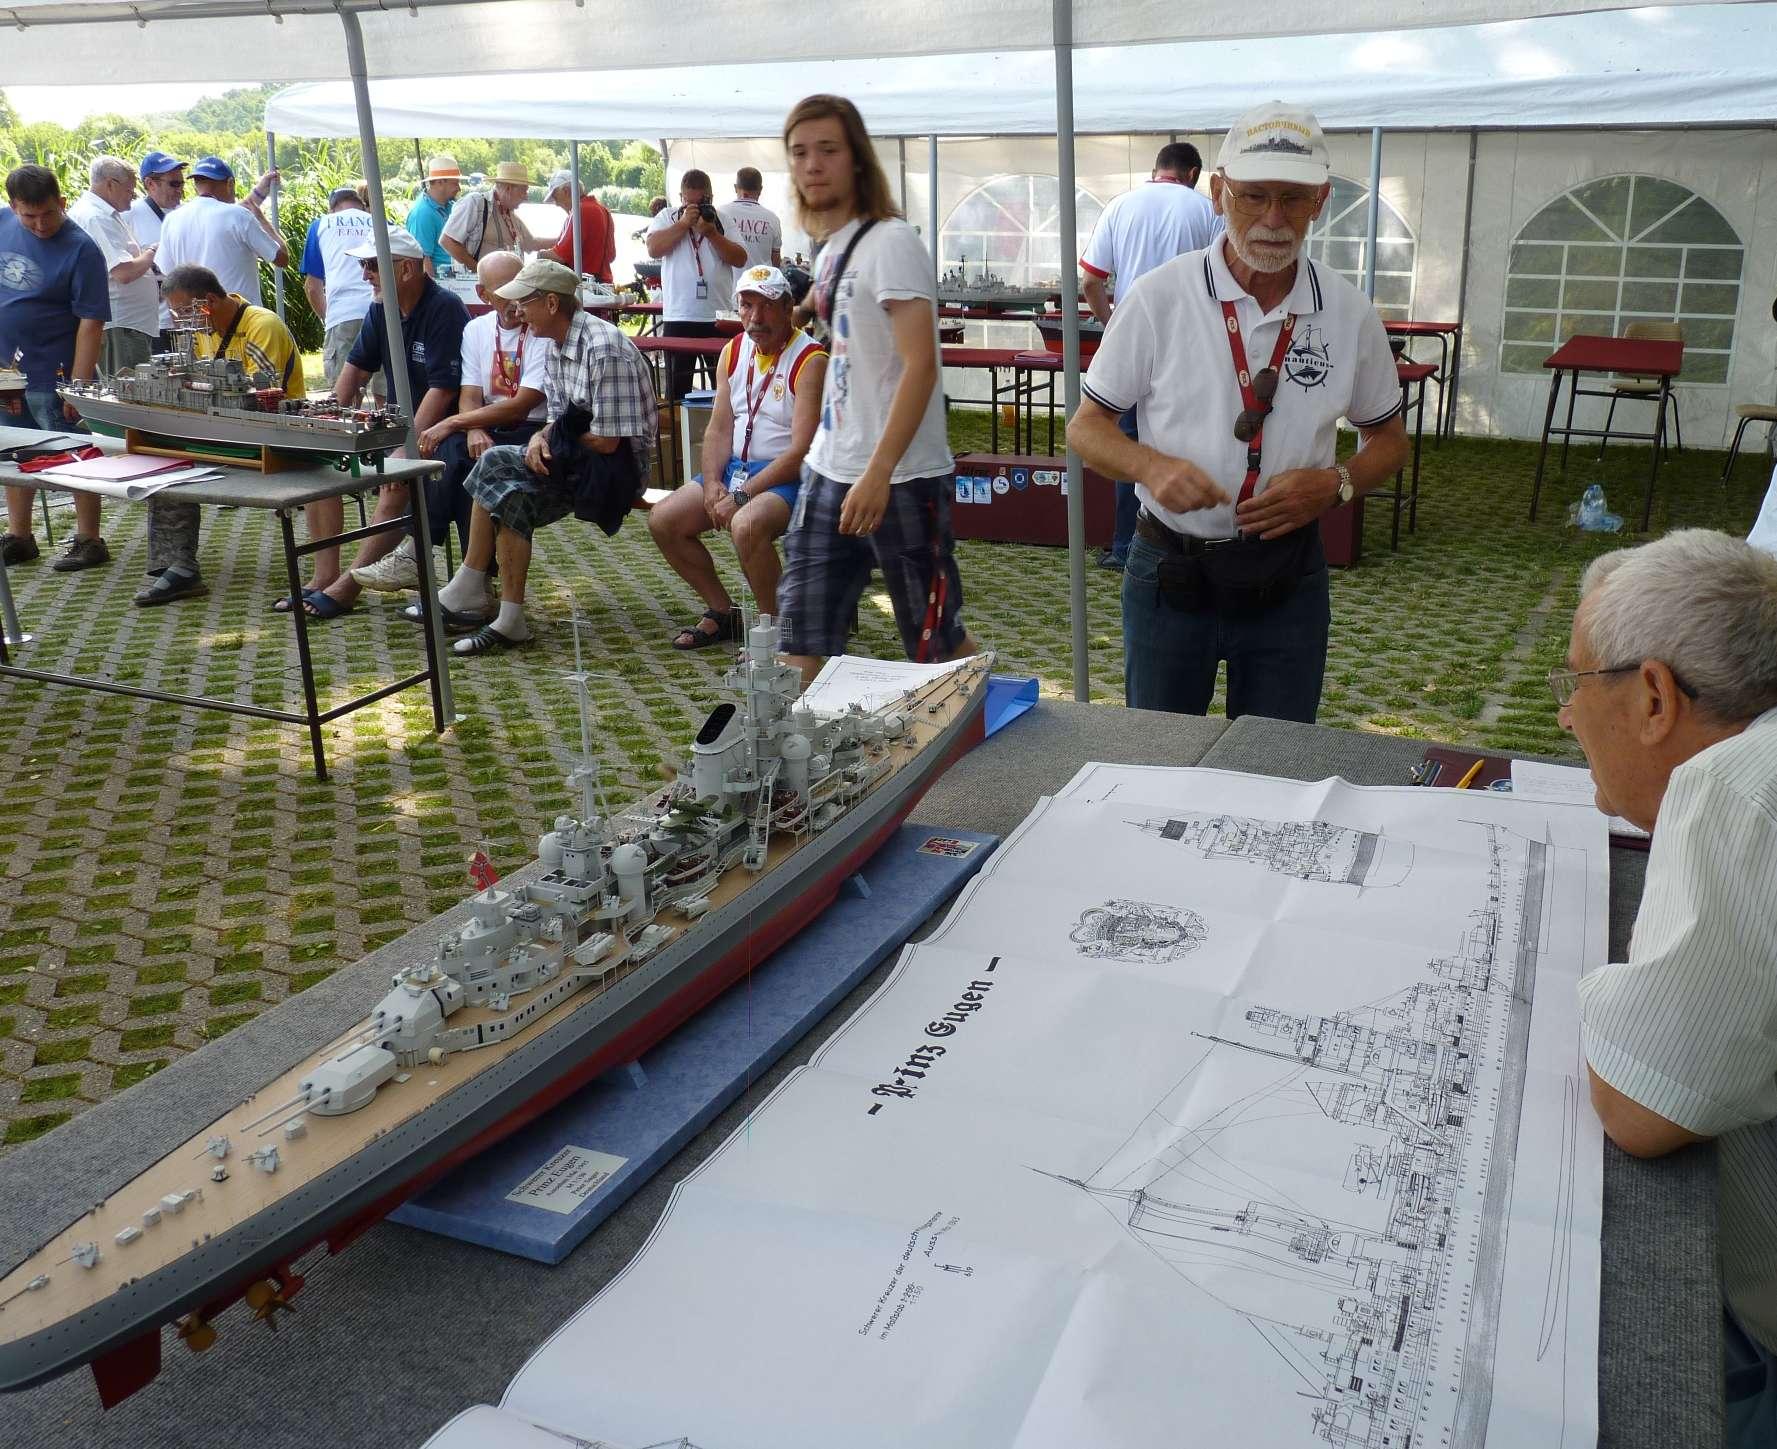 DKM Prinz Eugen, Heller 1/400  - Page 2 10-3888919-p1240131